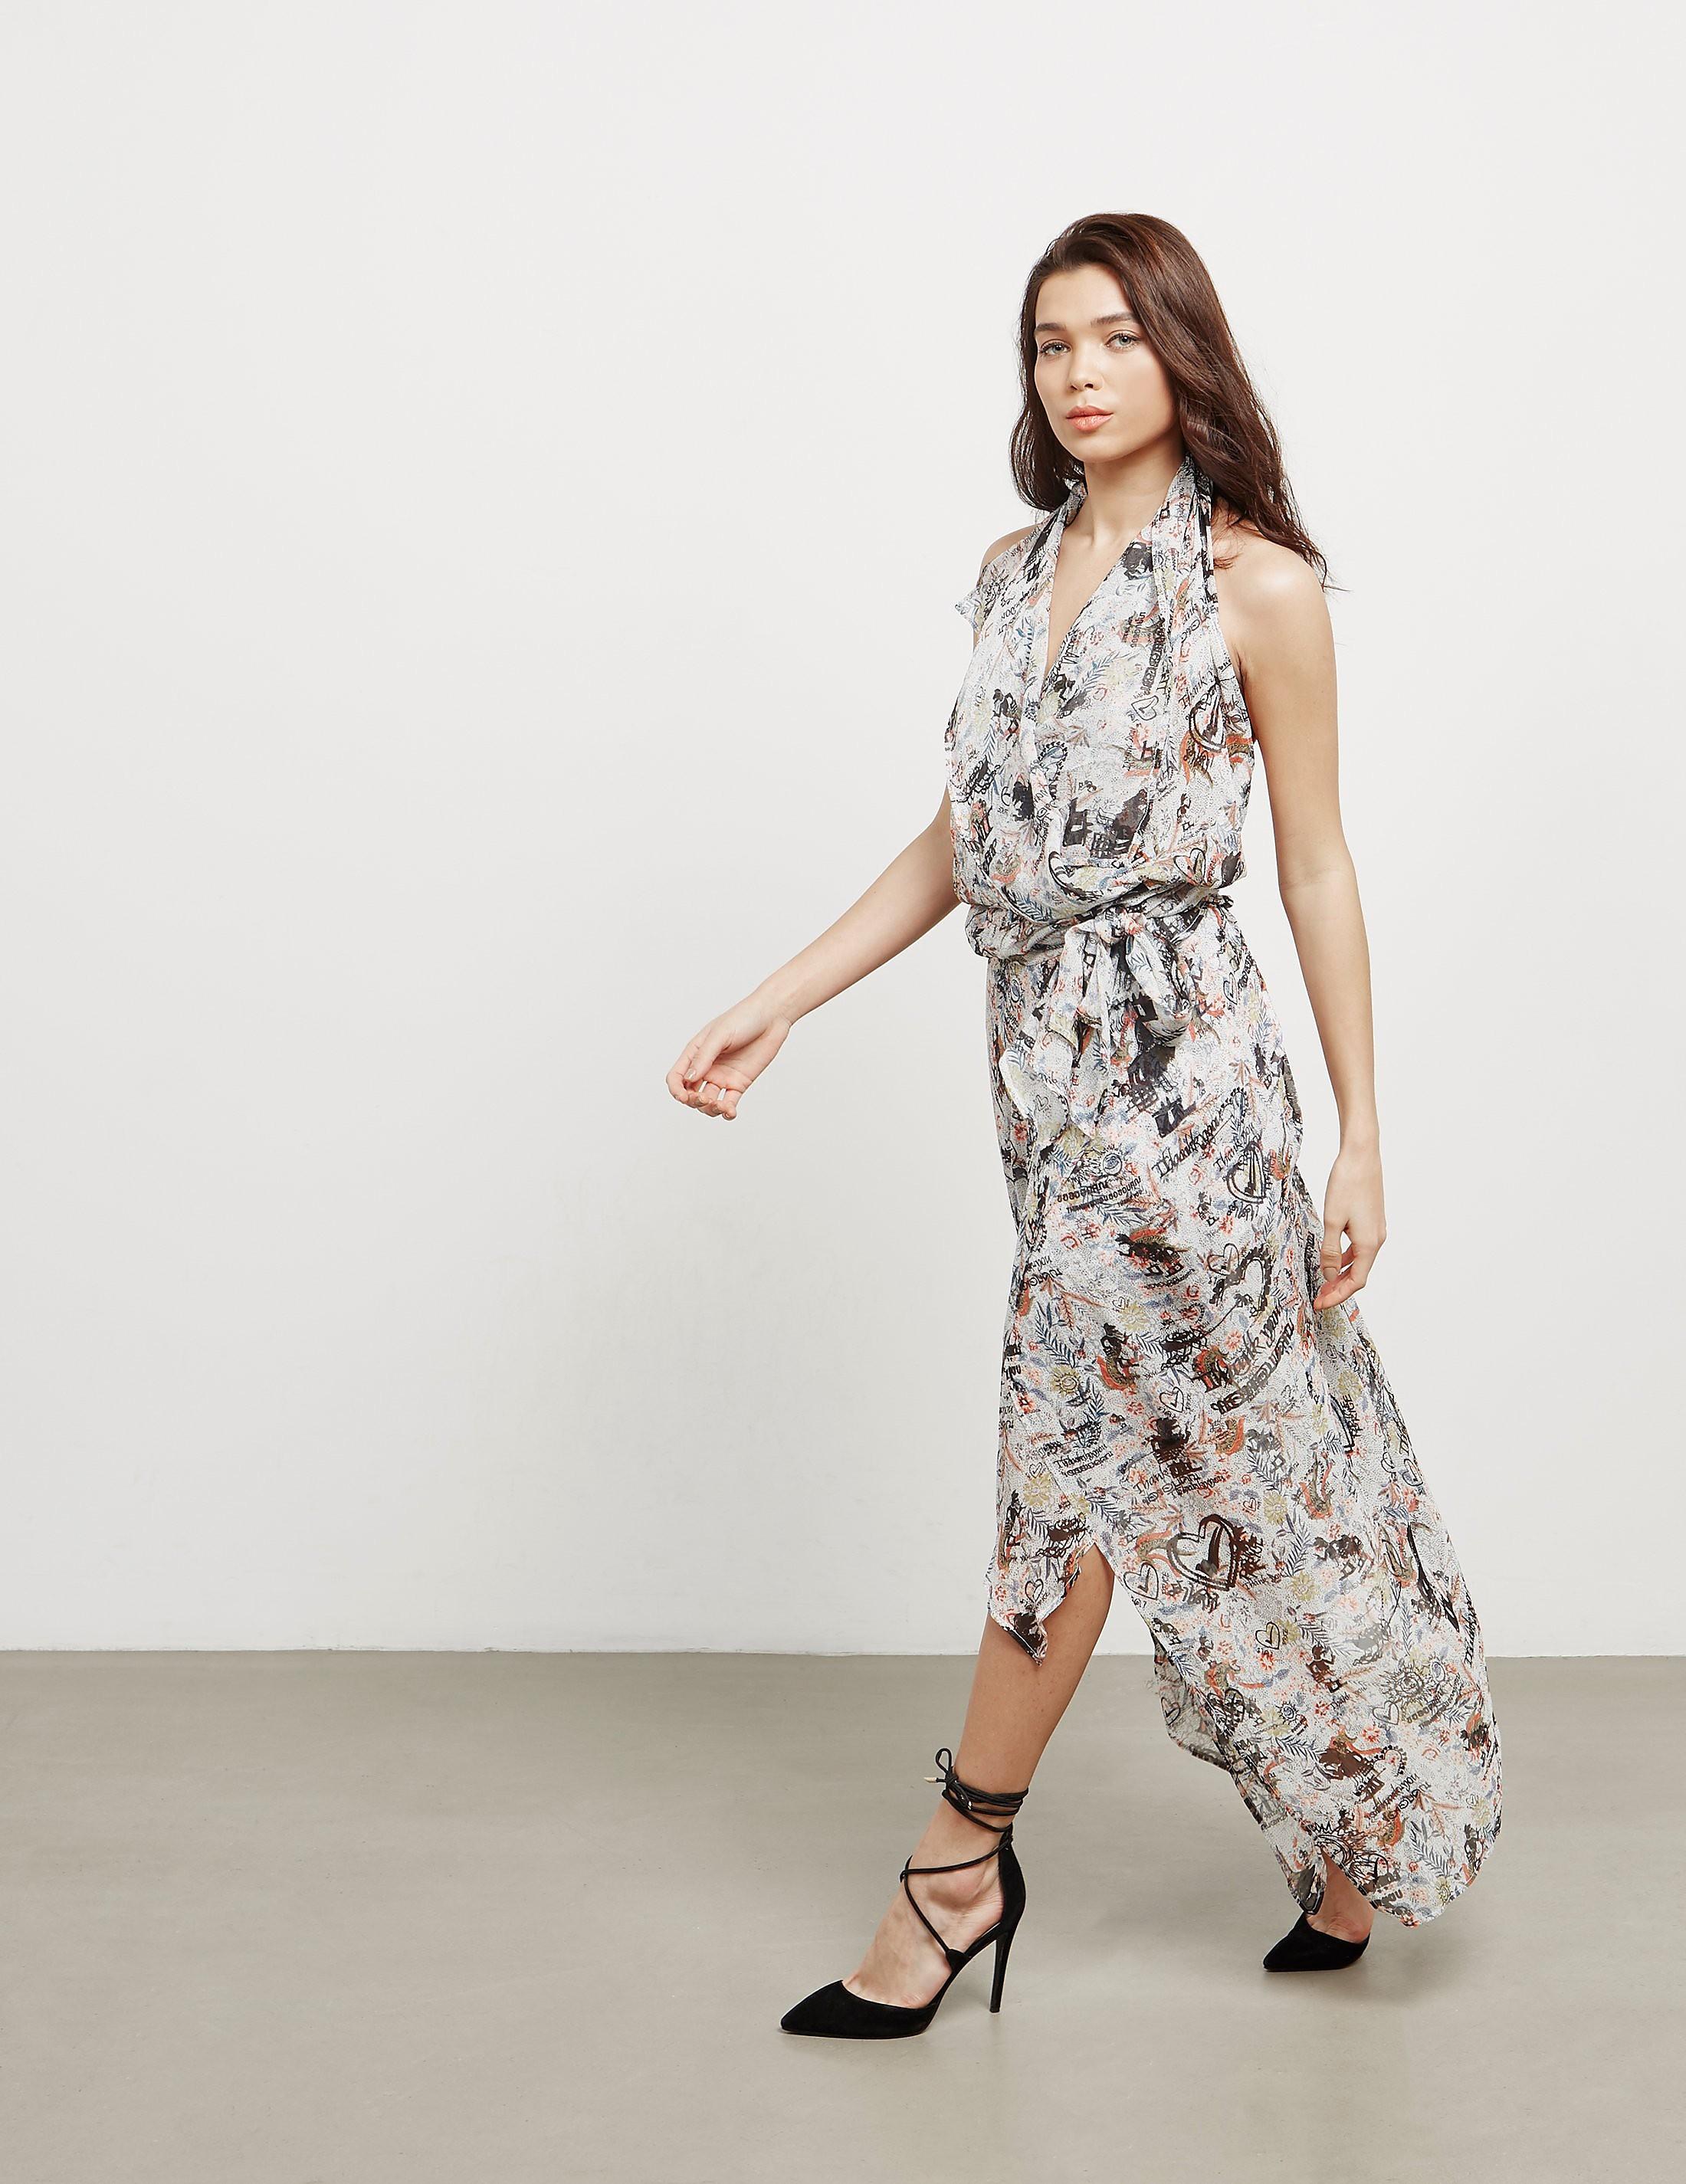 Vivienne Westwood Anglomania Temperance Dress